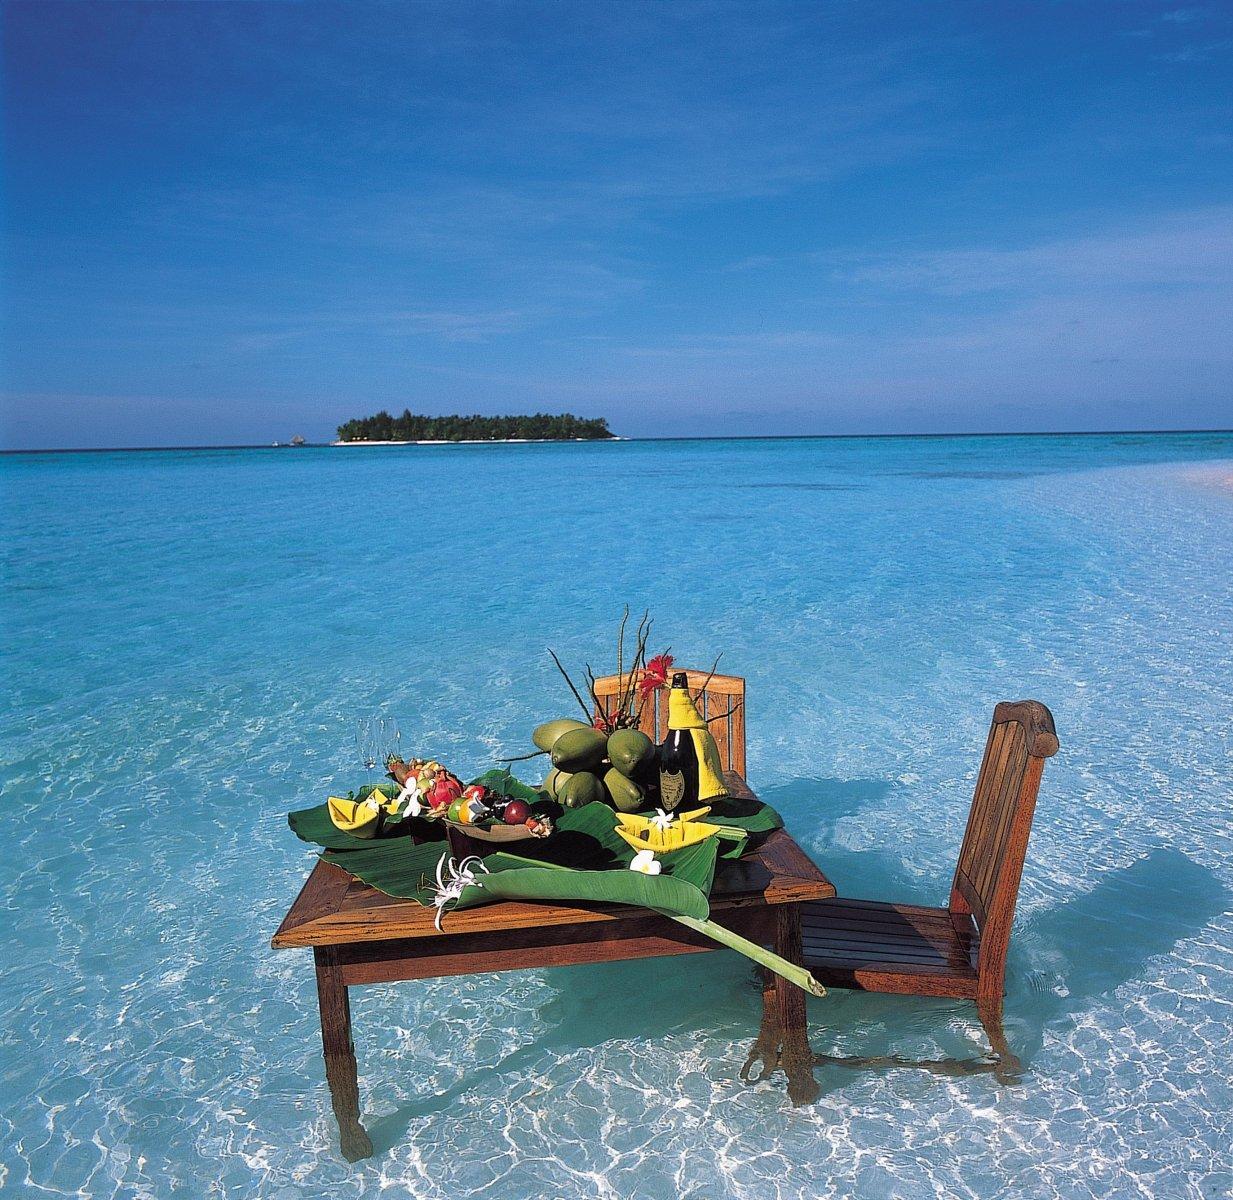 maldives_wallpapers_by_antonov_1650278